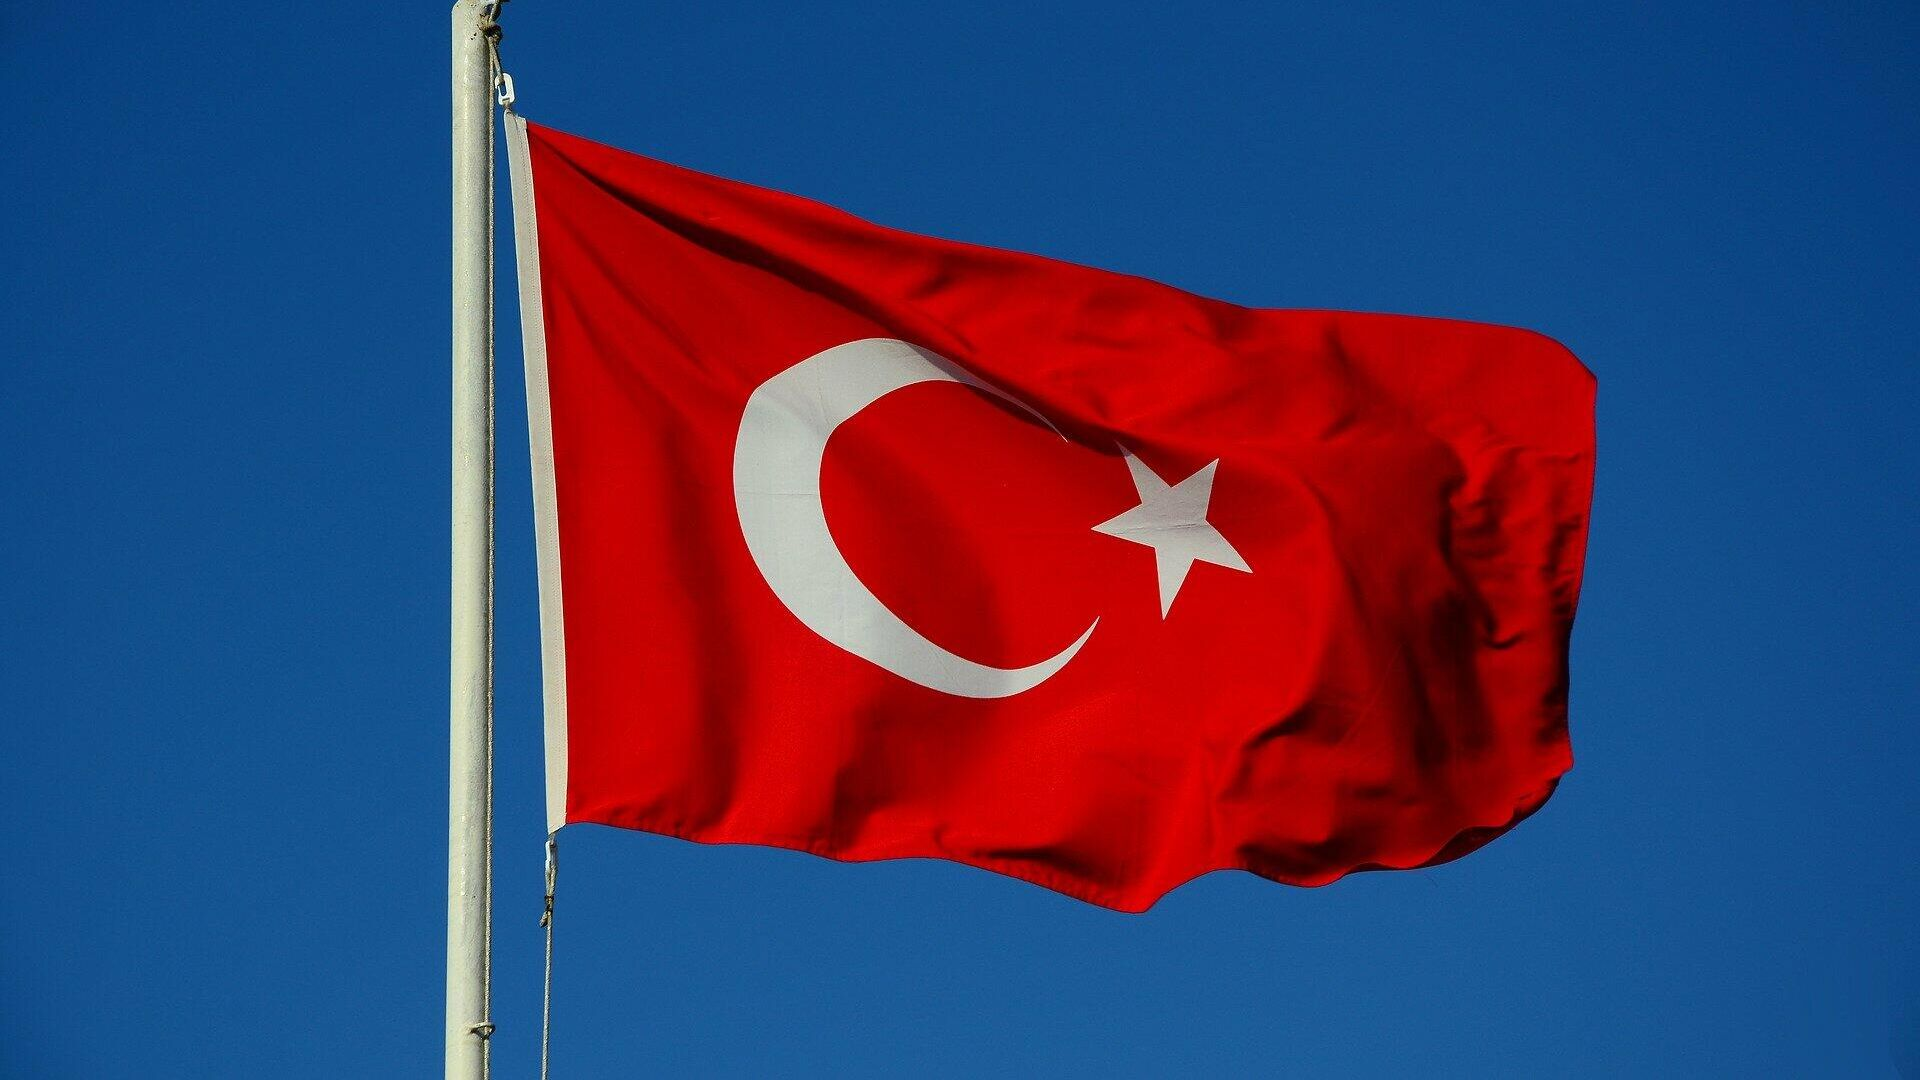 Flagge der Türkei - SNA, 1920, 27.07.2021